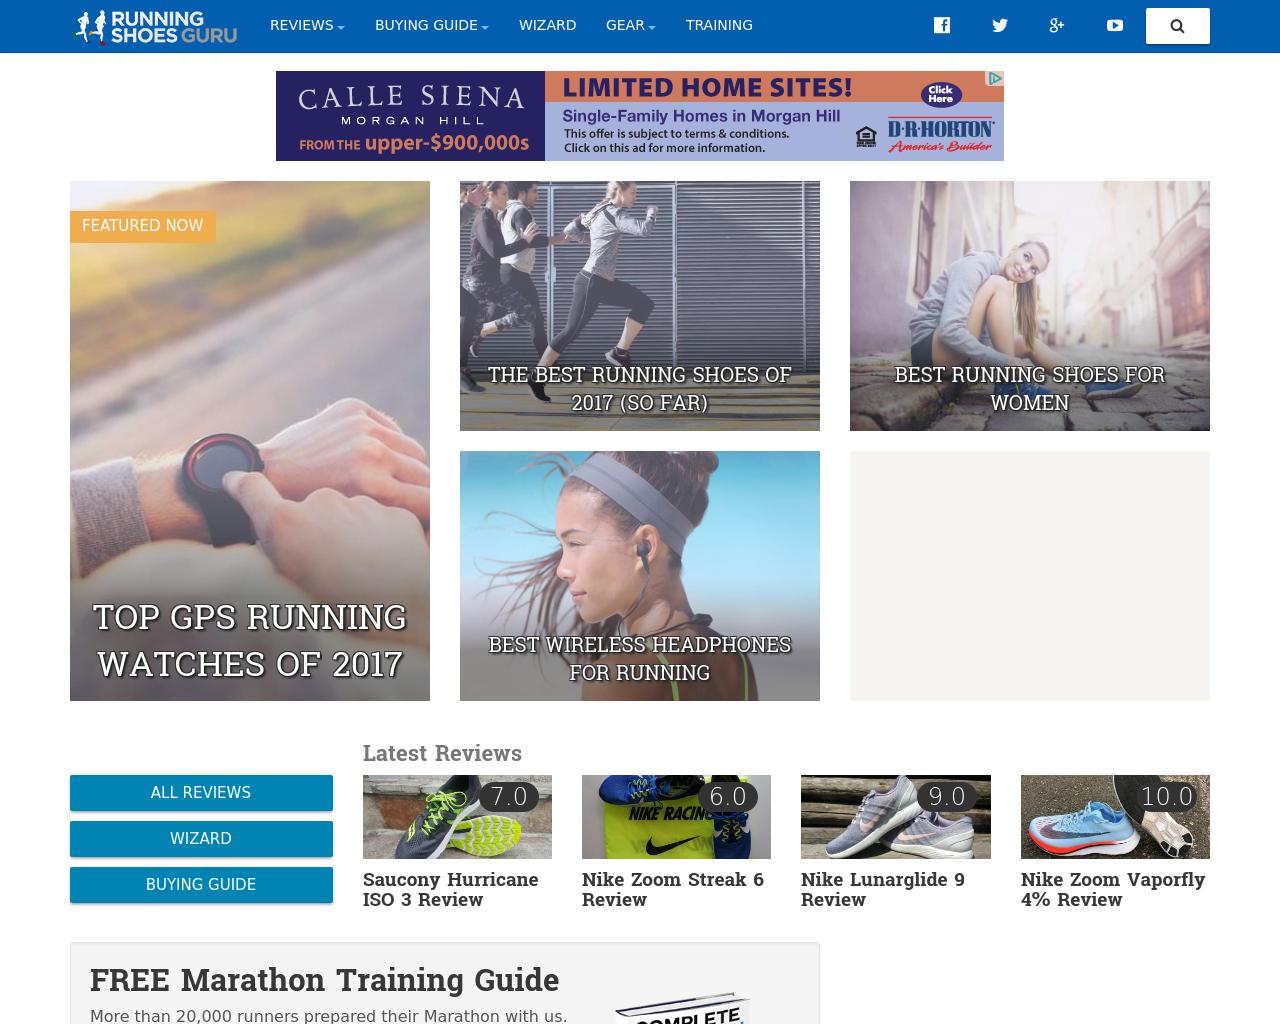 Running-Shoes-Guru-Advertising-Reviews-Pricing